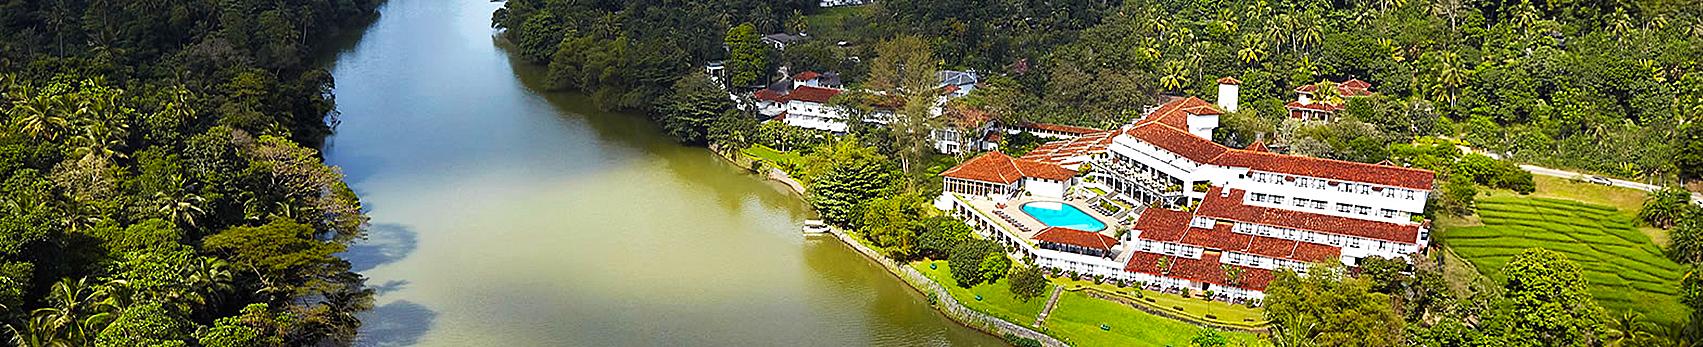 Cinnamon Citadel Kandy Cover Image